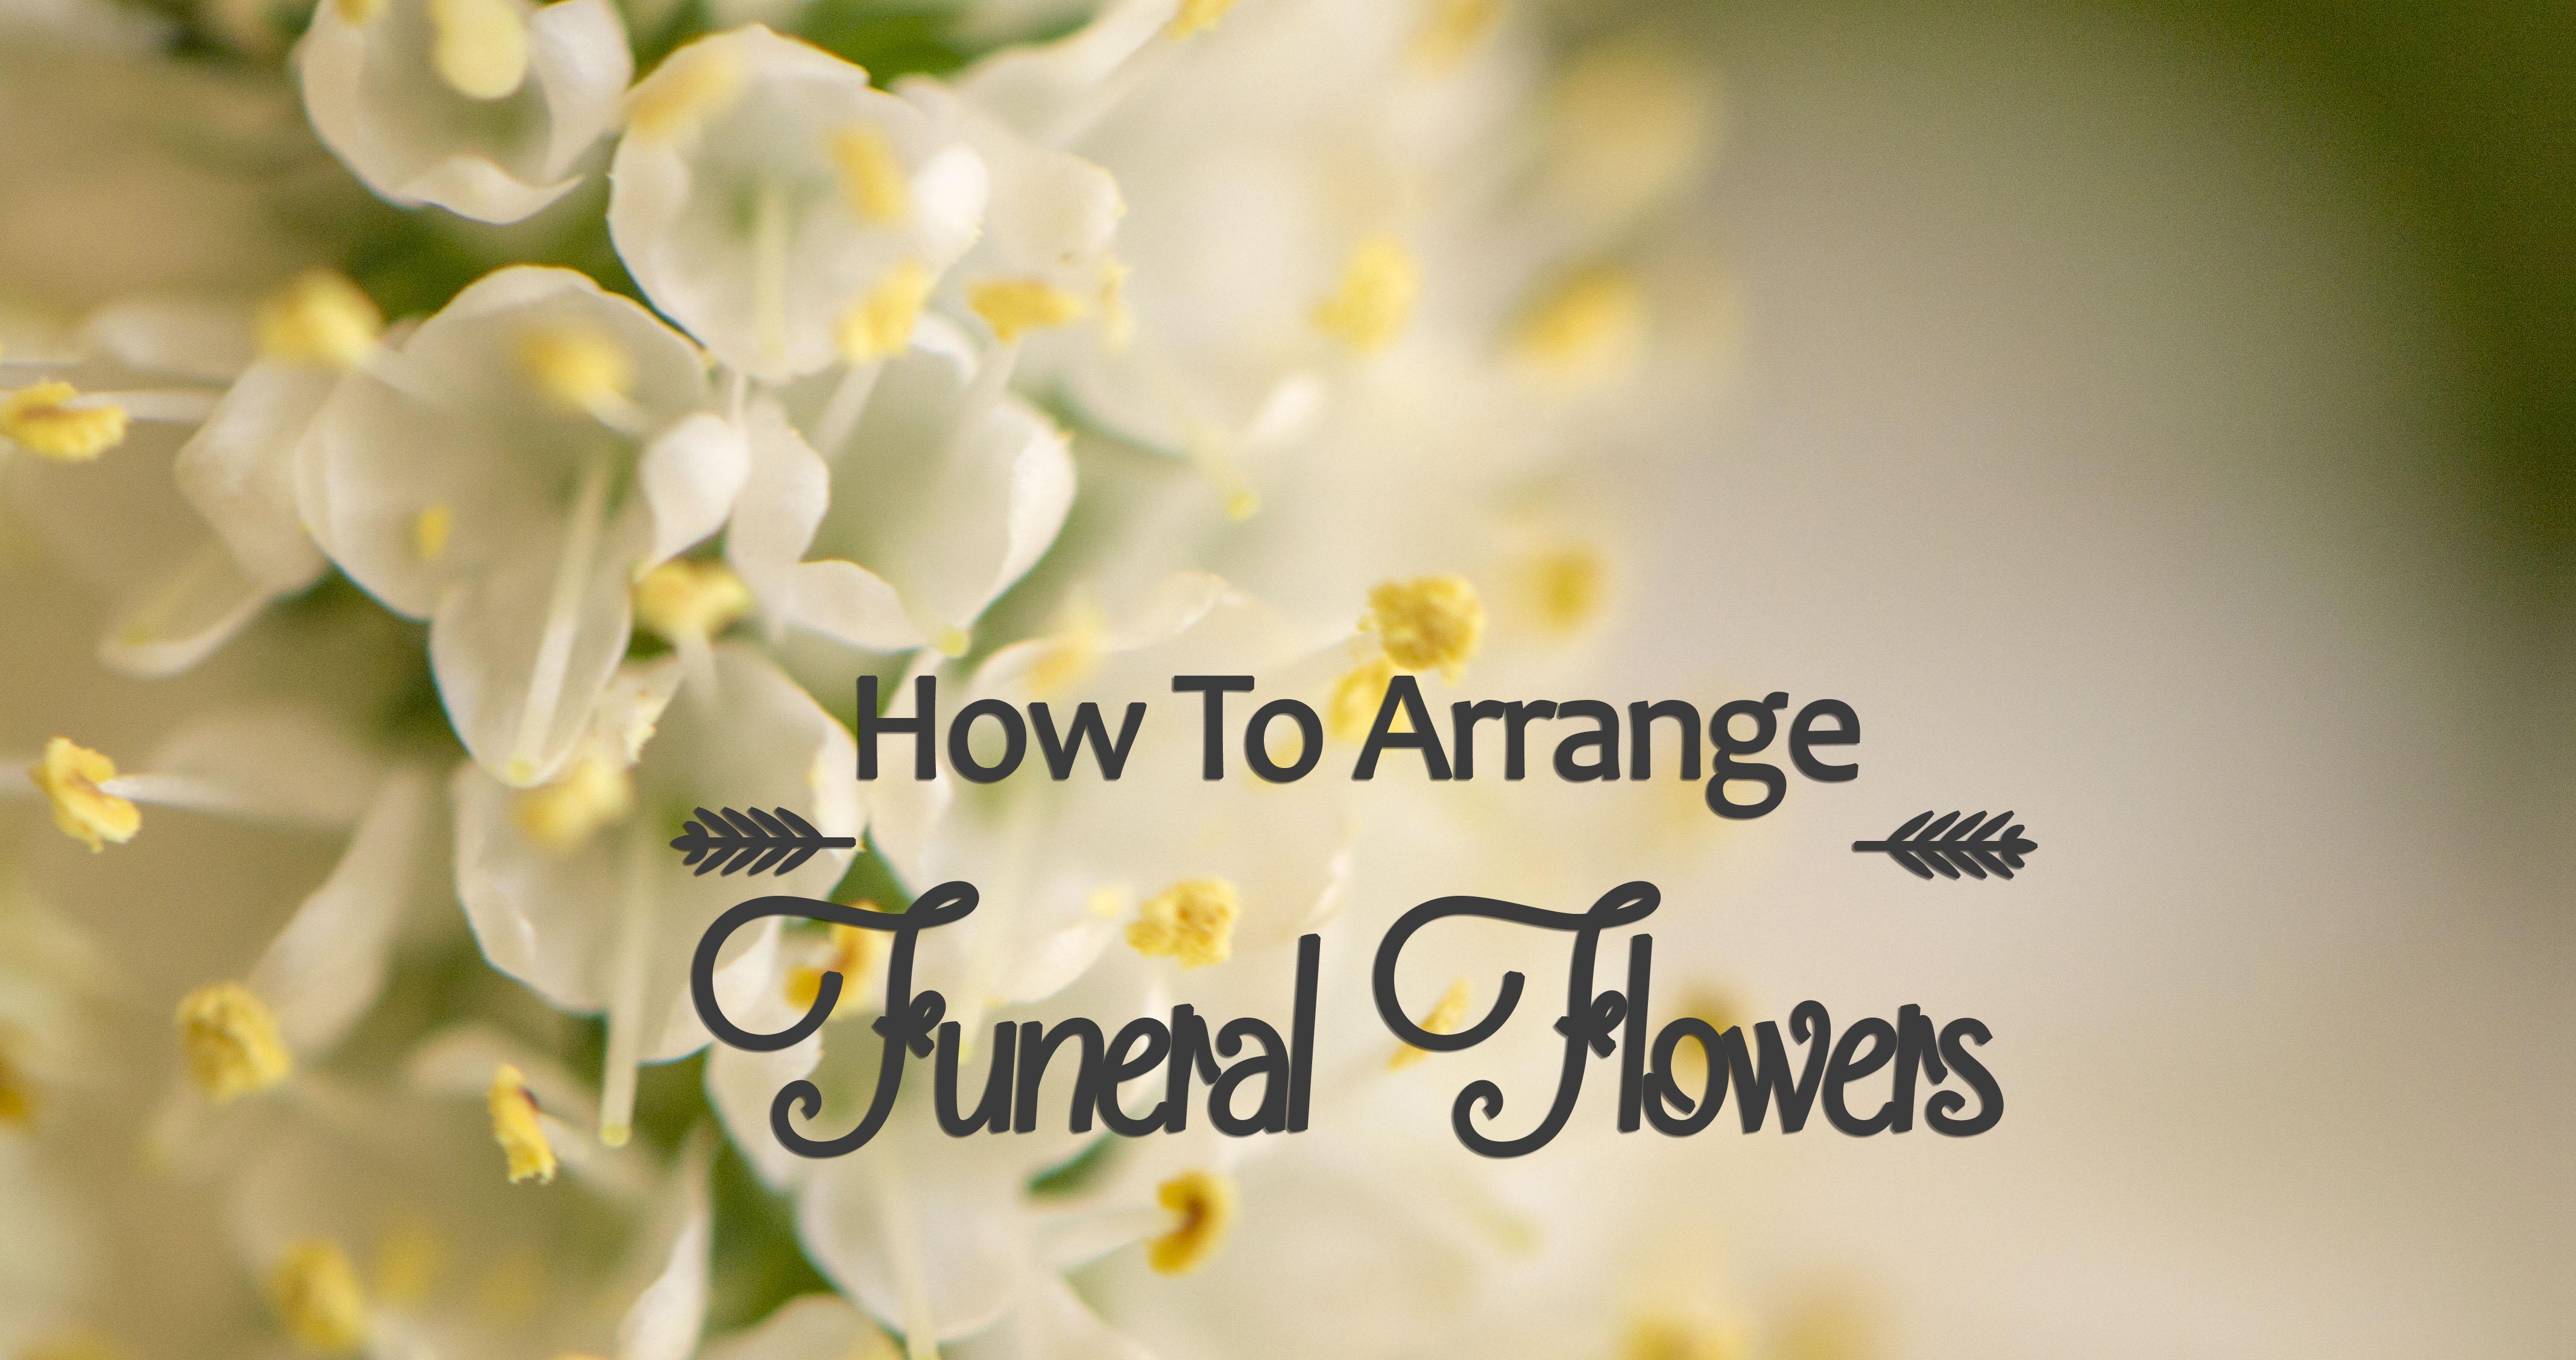 How To Arrange Funeral Flowers Diy Flower Arranging